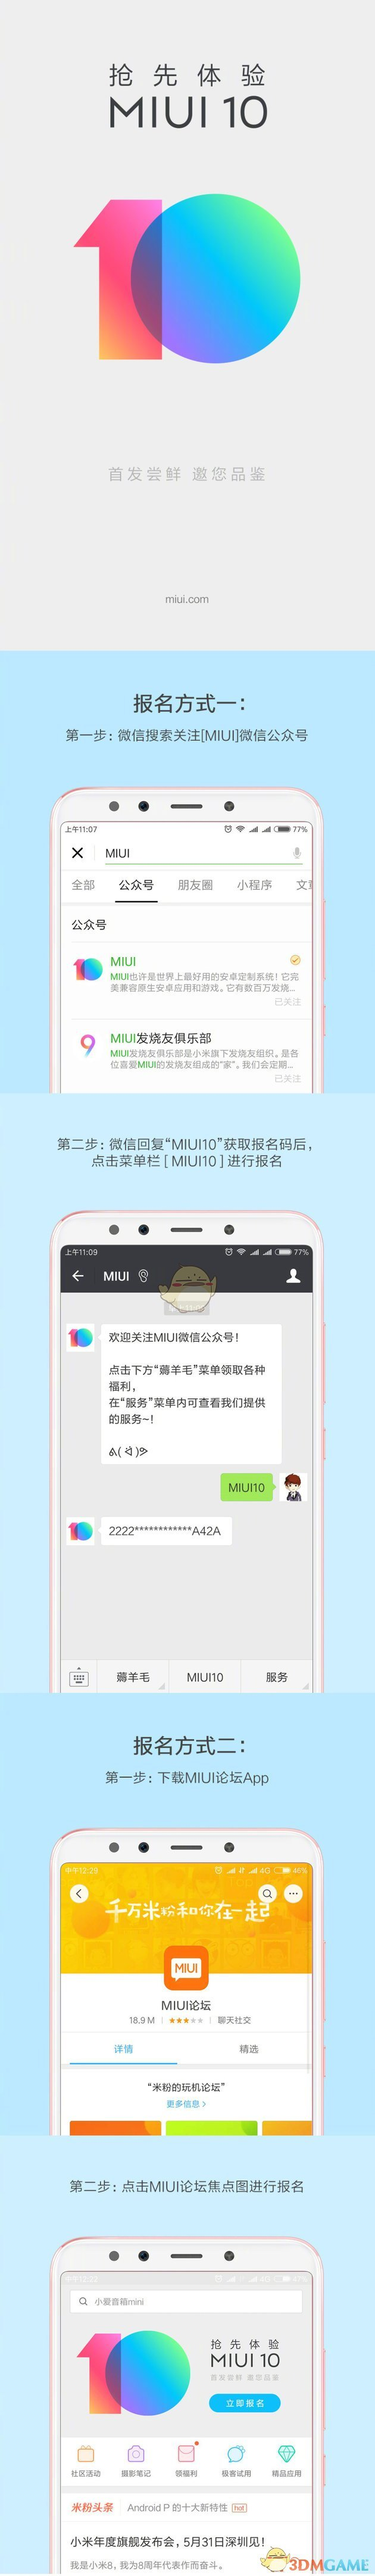 MIUI10预约方法介绍